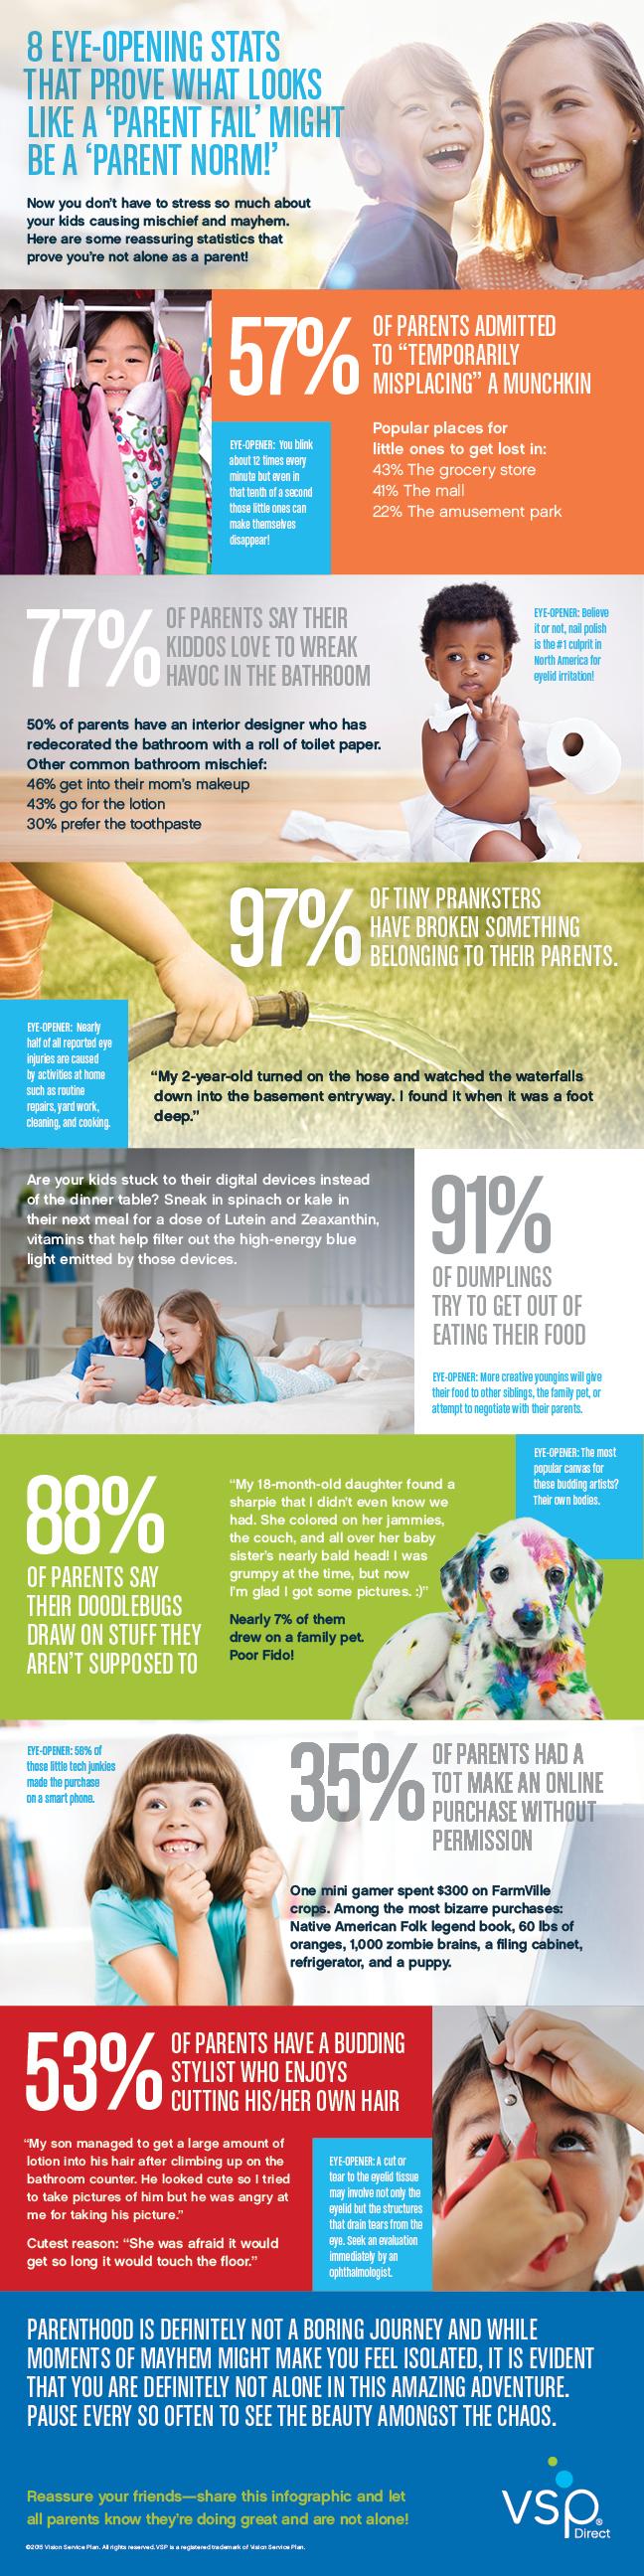 Parenting infographic